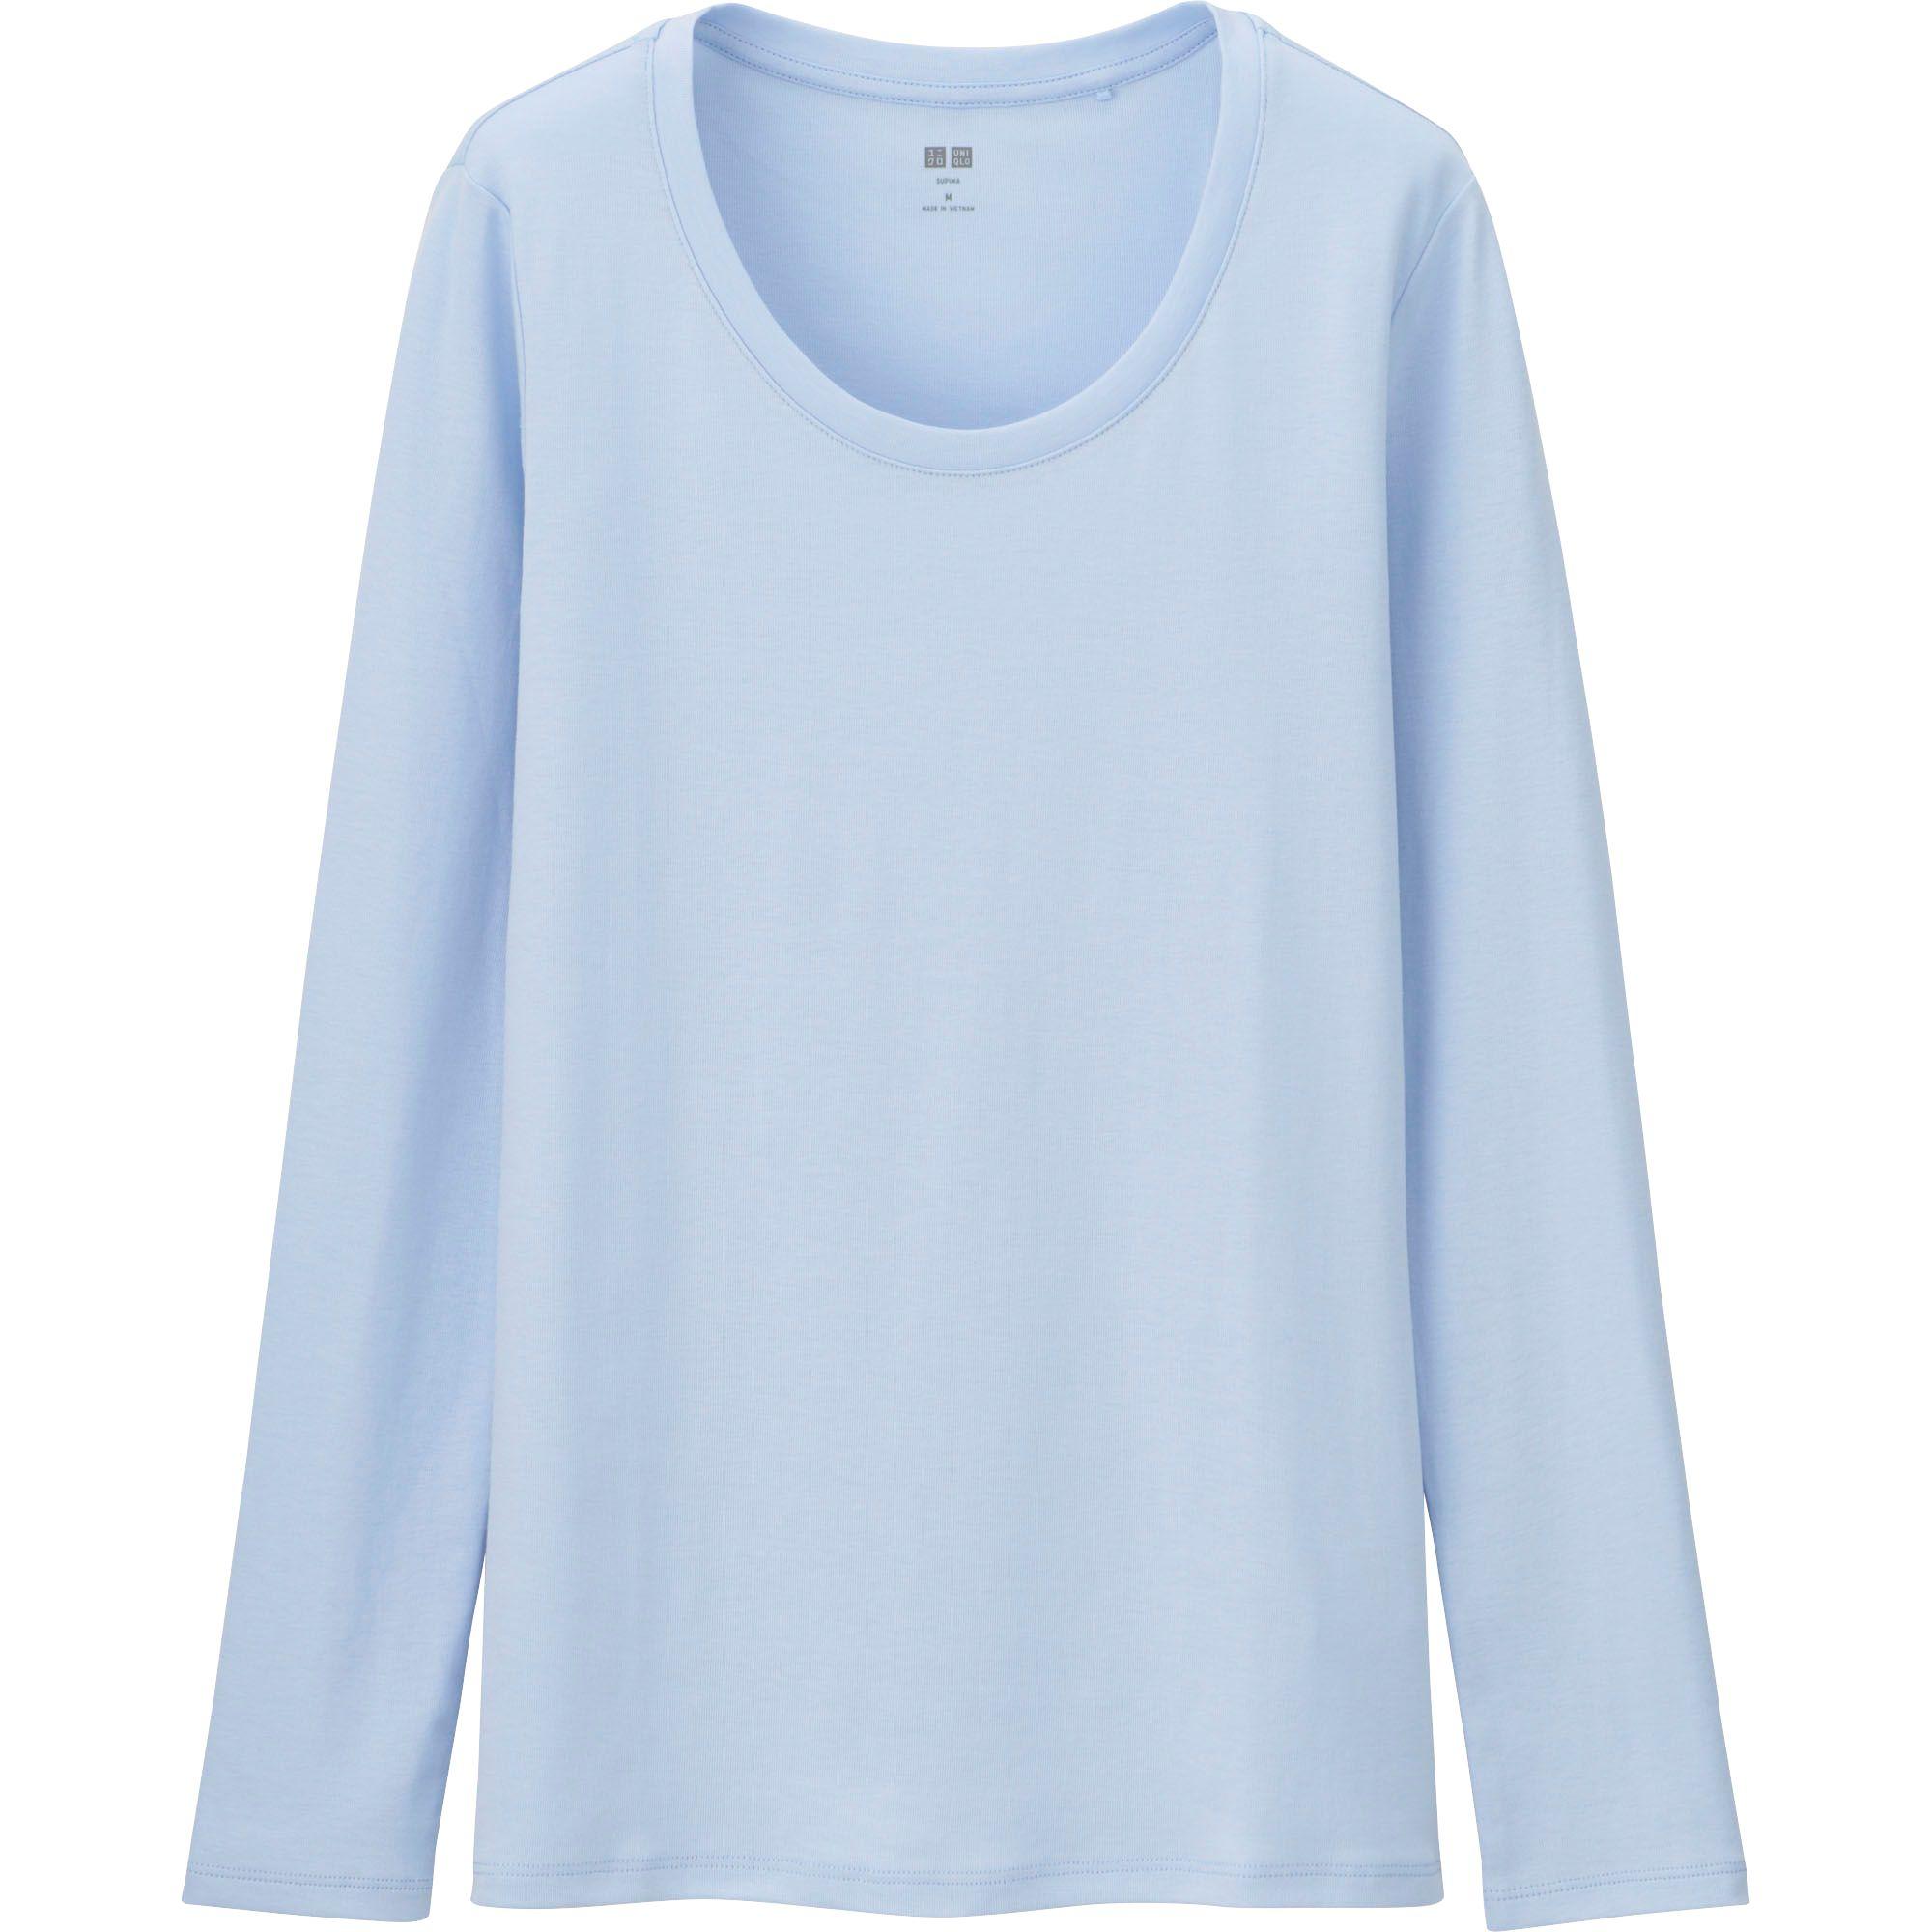 Uniqlo Women Supima Cotton Crewneck Long Sleeve T Shirt In